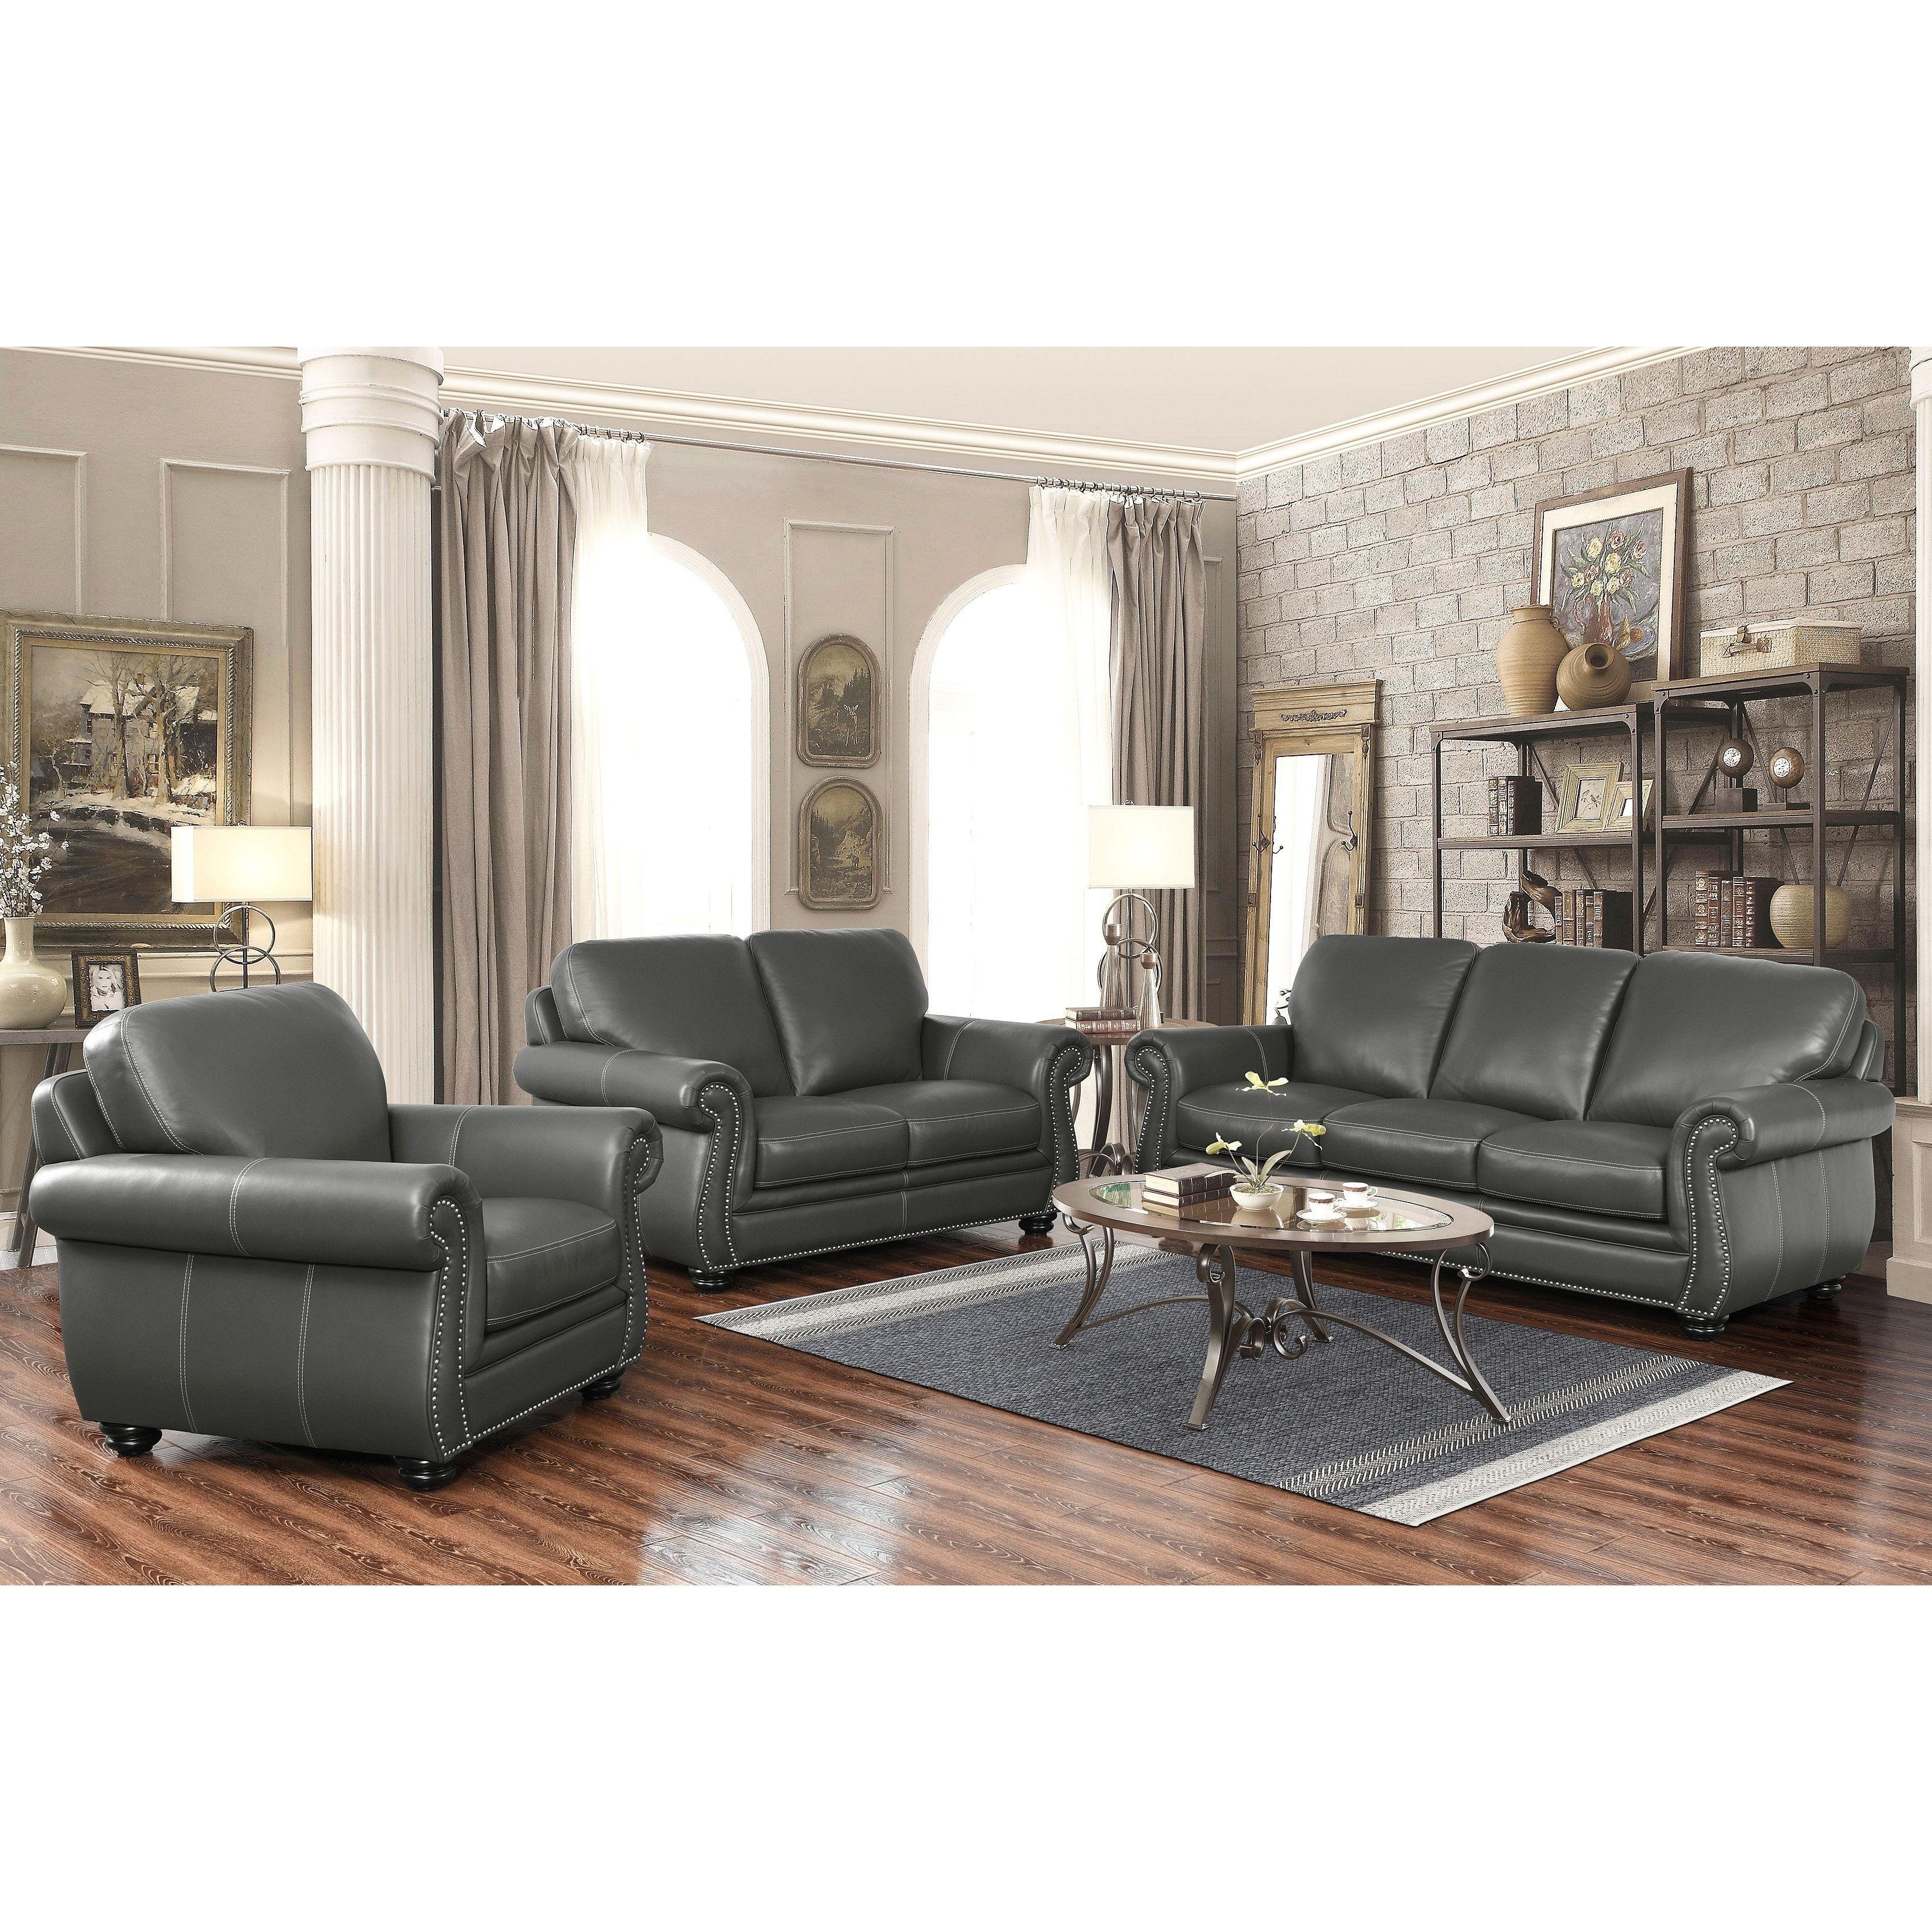 Best Abbyson Kassidy Grey Top Grain Leather 3 Piece Living Room 400 x 300